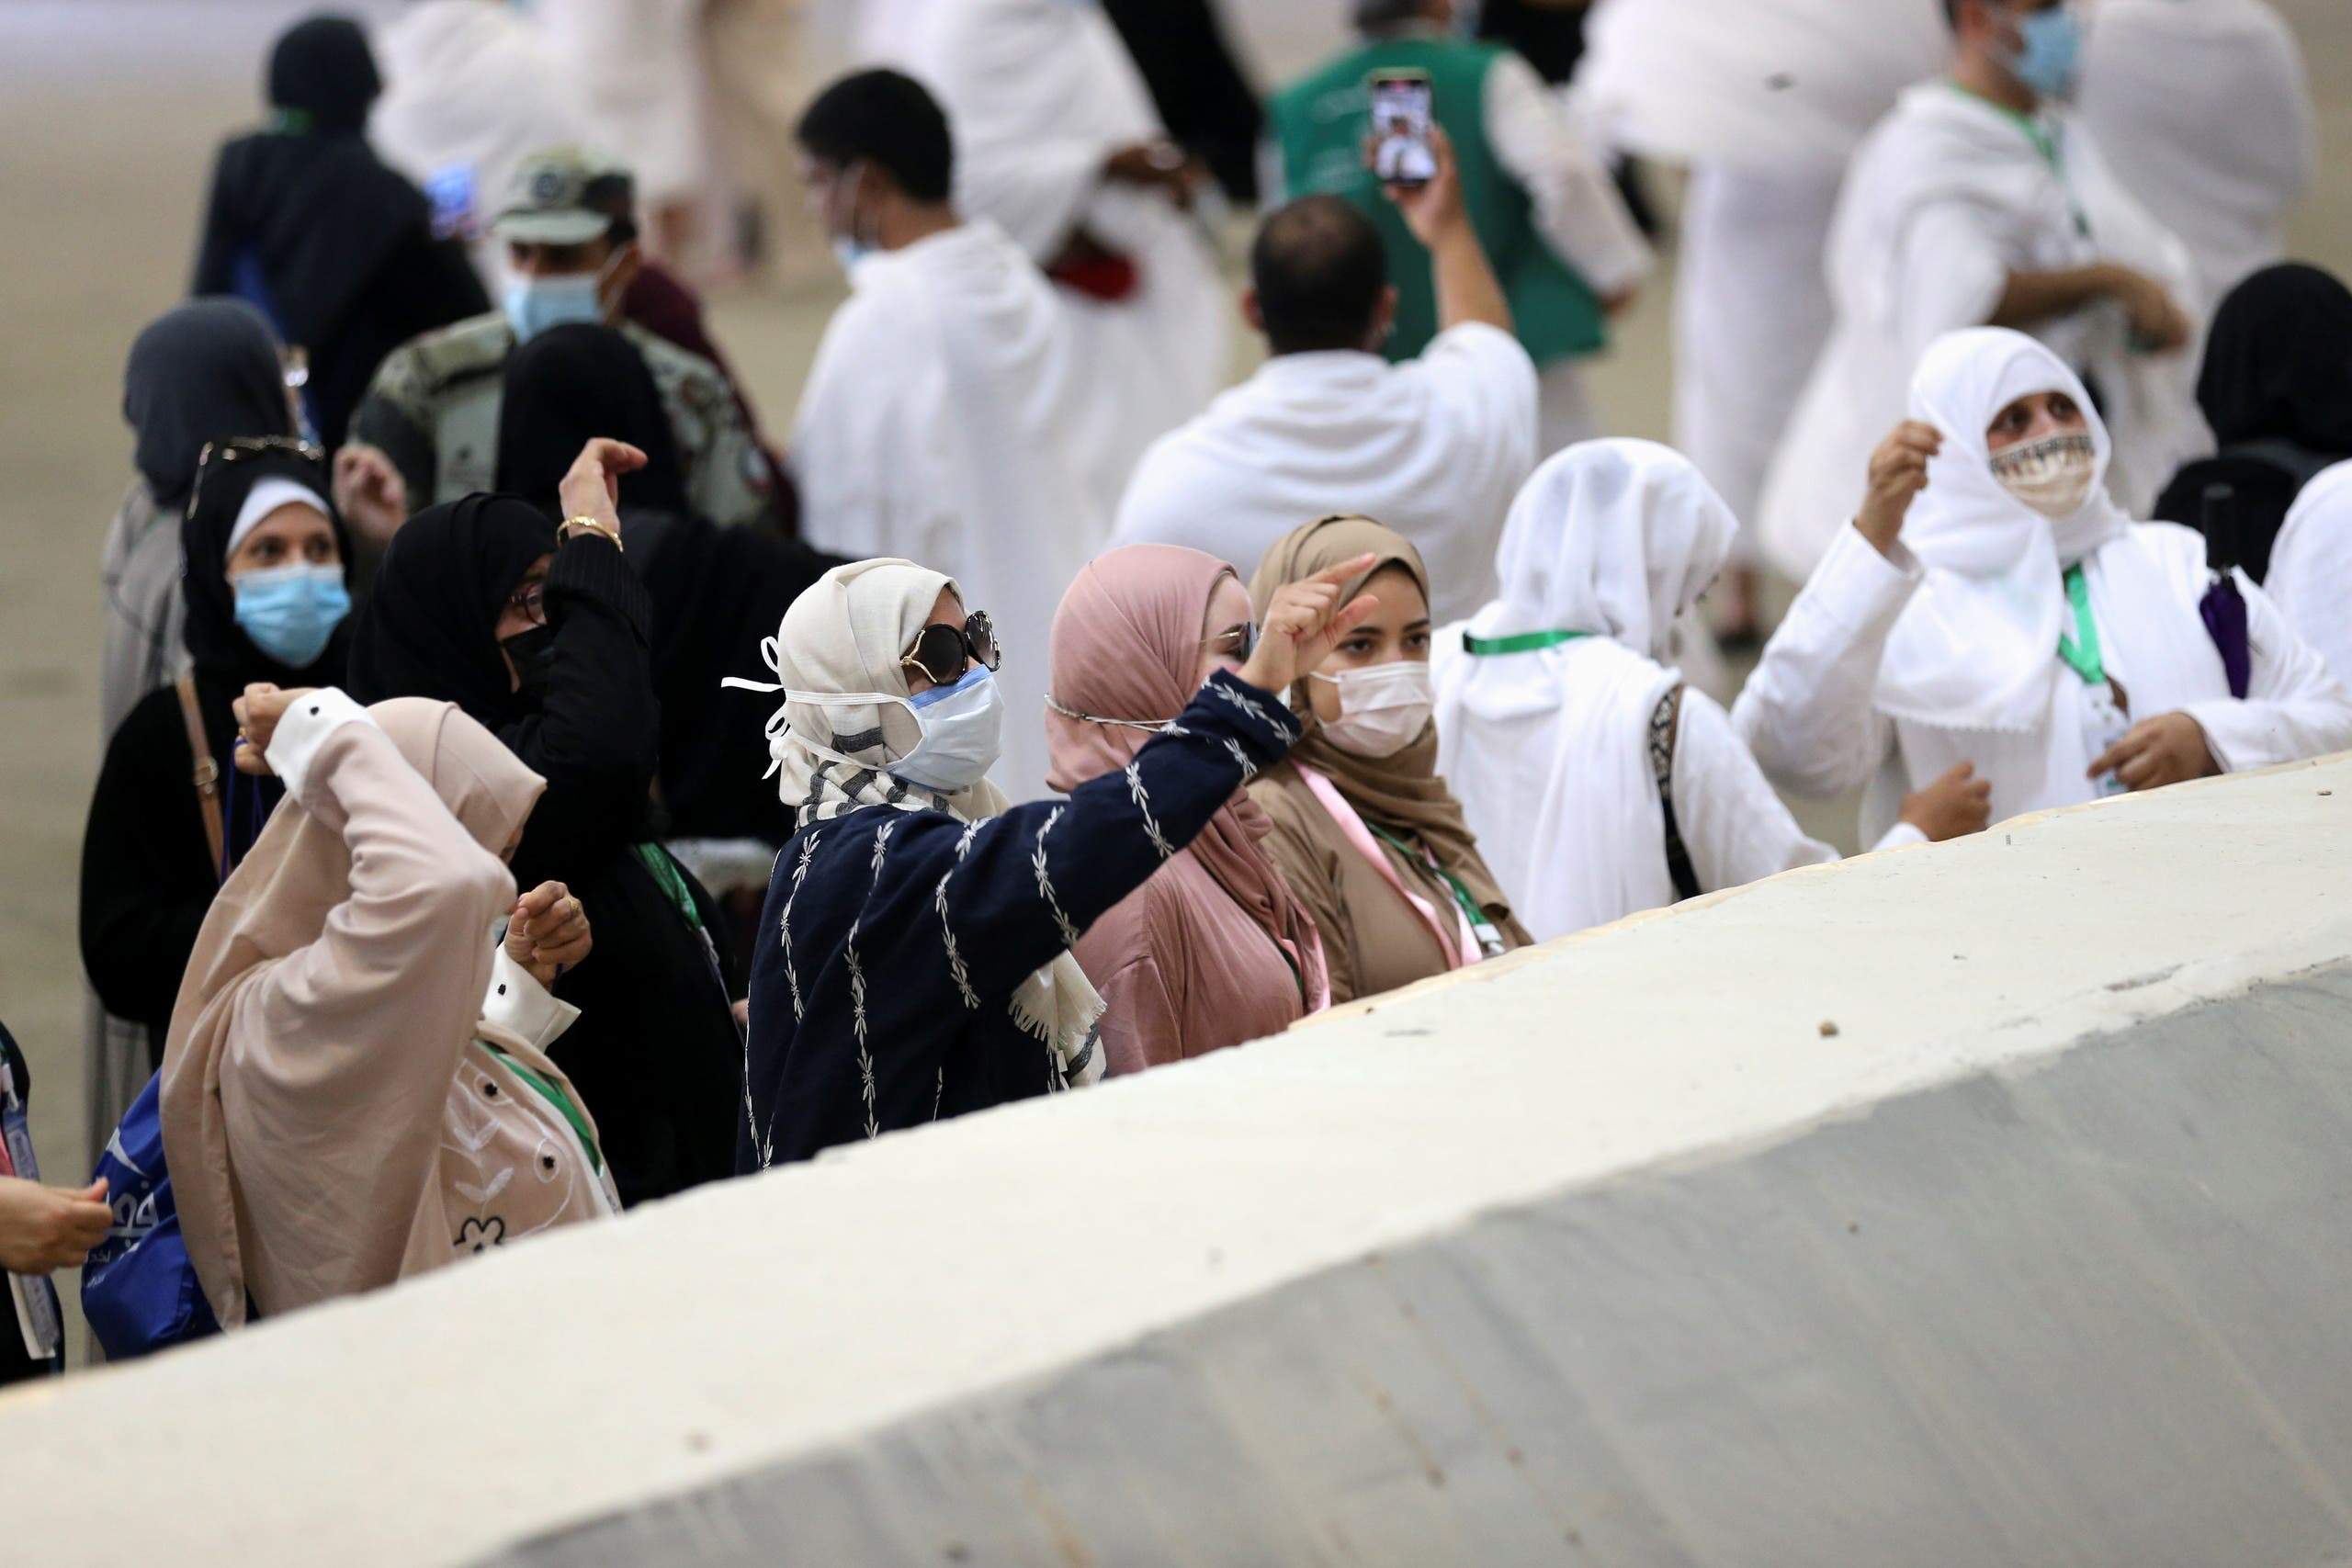 Muslim pilgrims cast stones at a pillar symbolizing Satan during the annual Haj pilgrimage, amid the coronavirus disease (COVID-19) pandemic, in Mina, near the holy city of Mecca, Saudi Arabia, July 20, 2021. (Reuters)